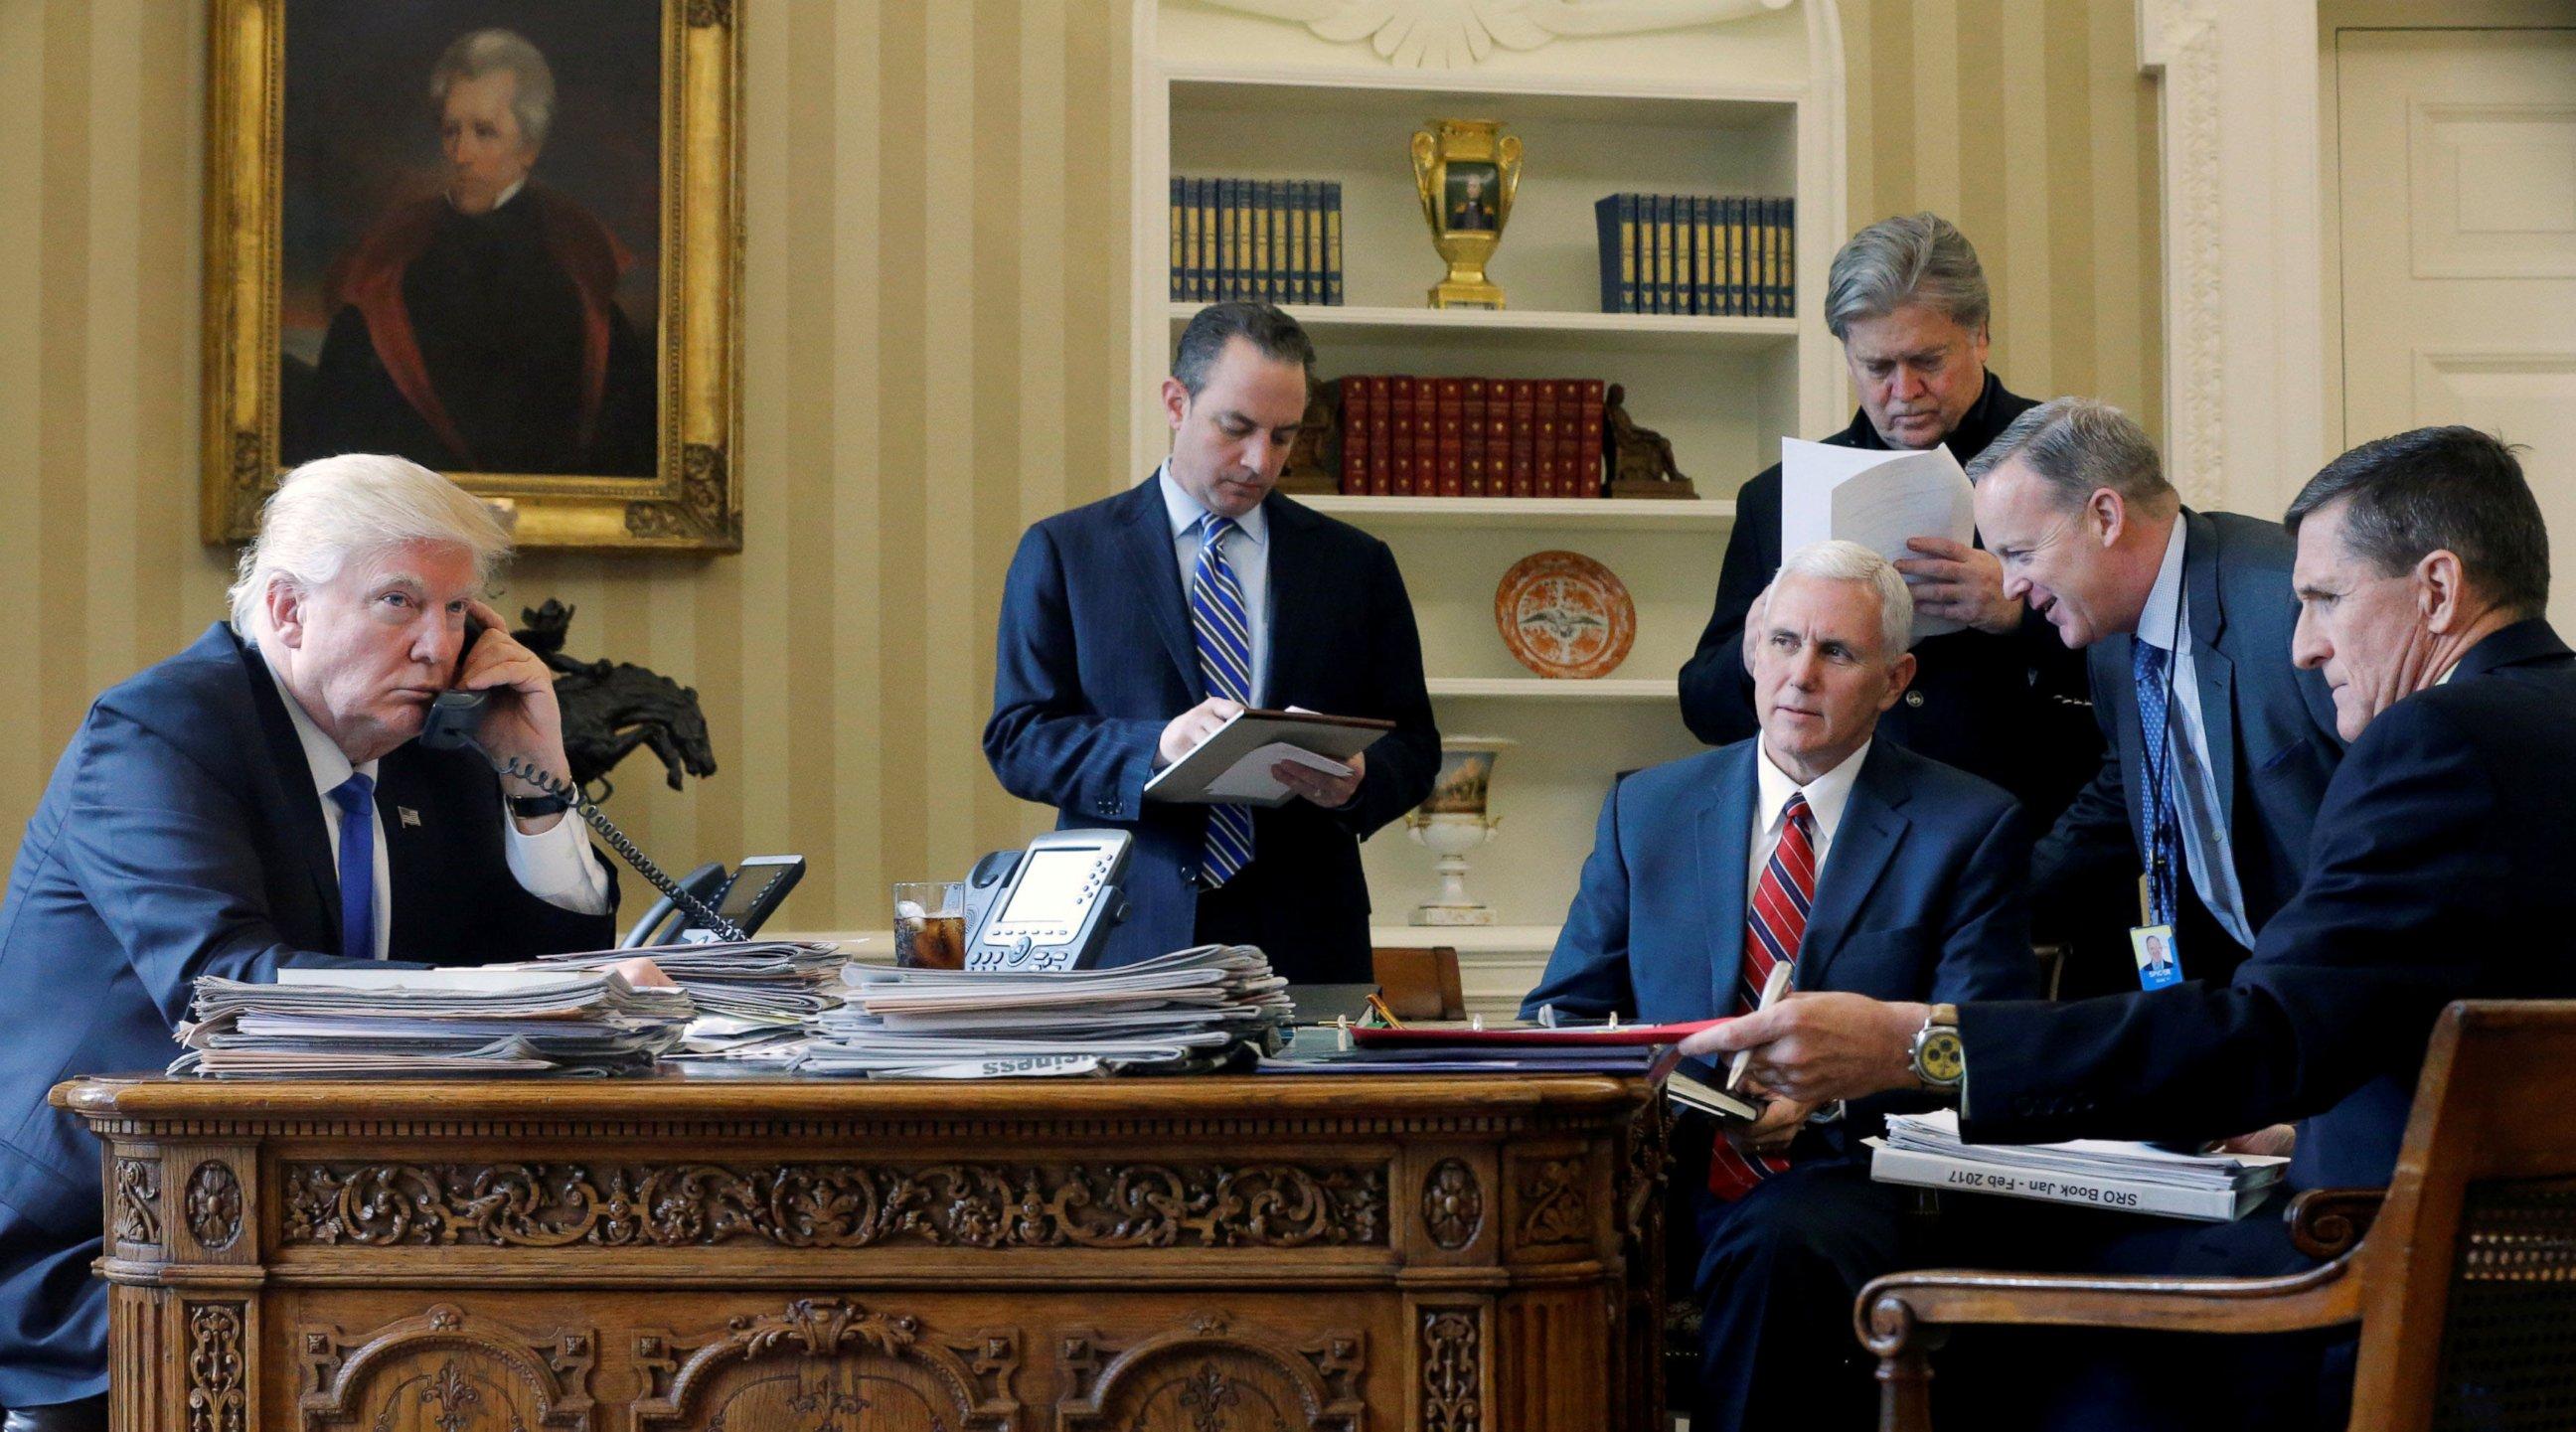 GC ordination experts lavish praise on gender of Trump's senior team